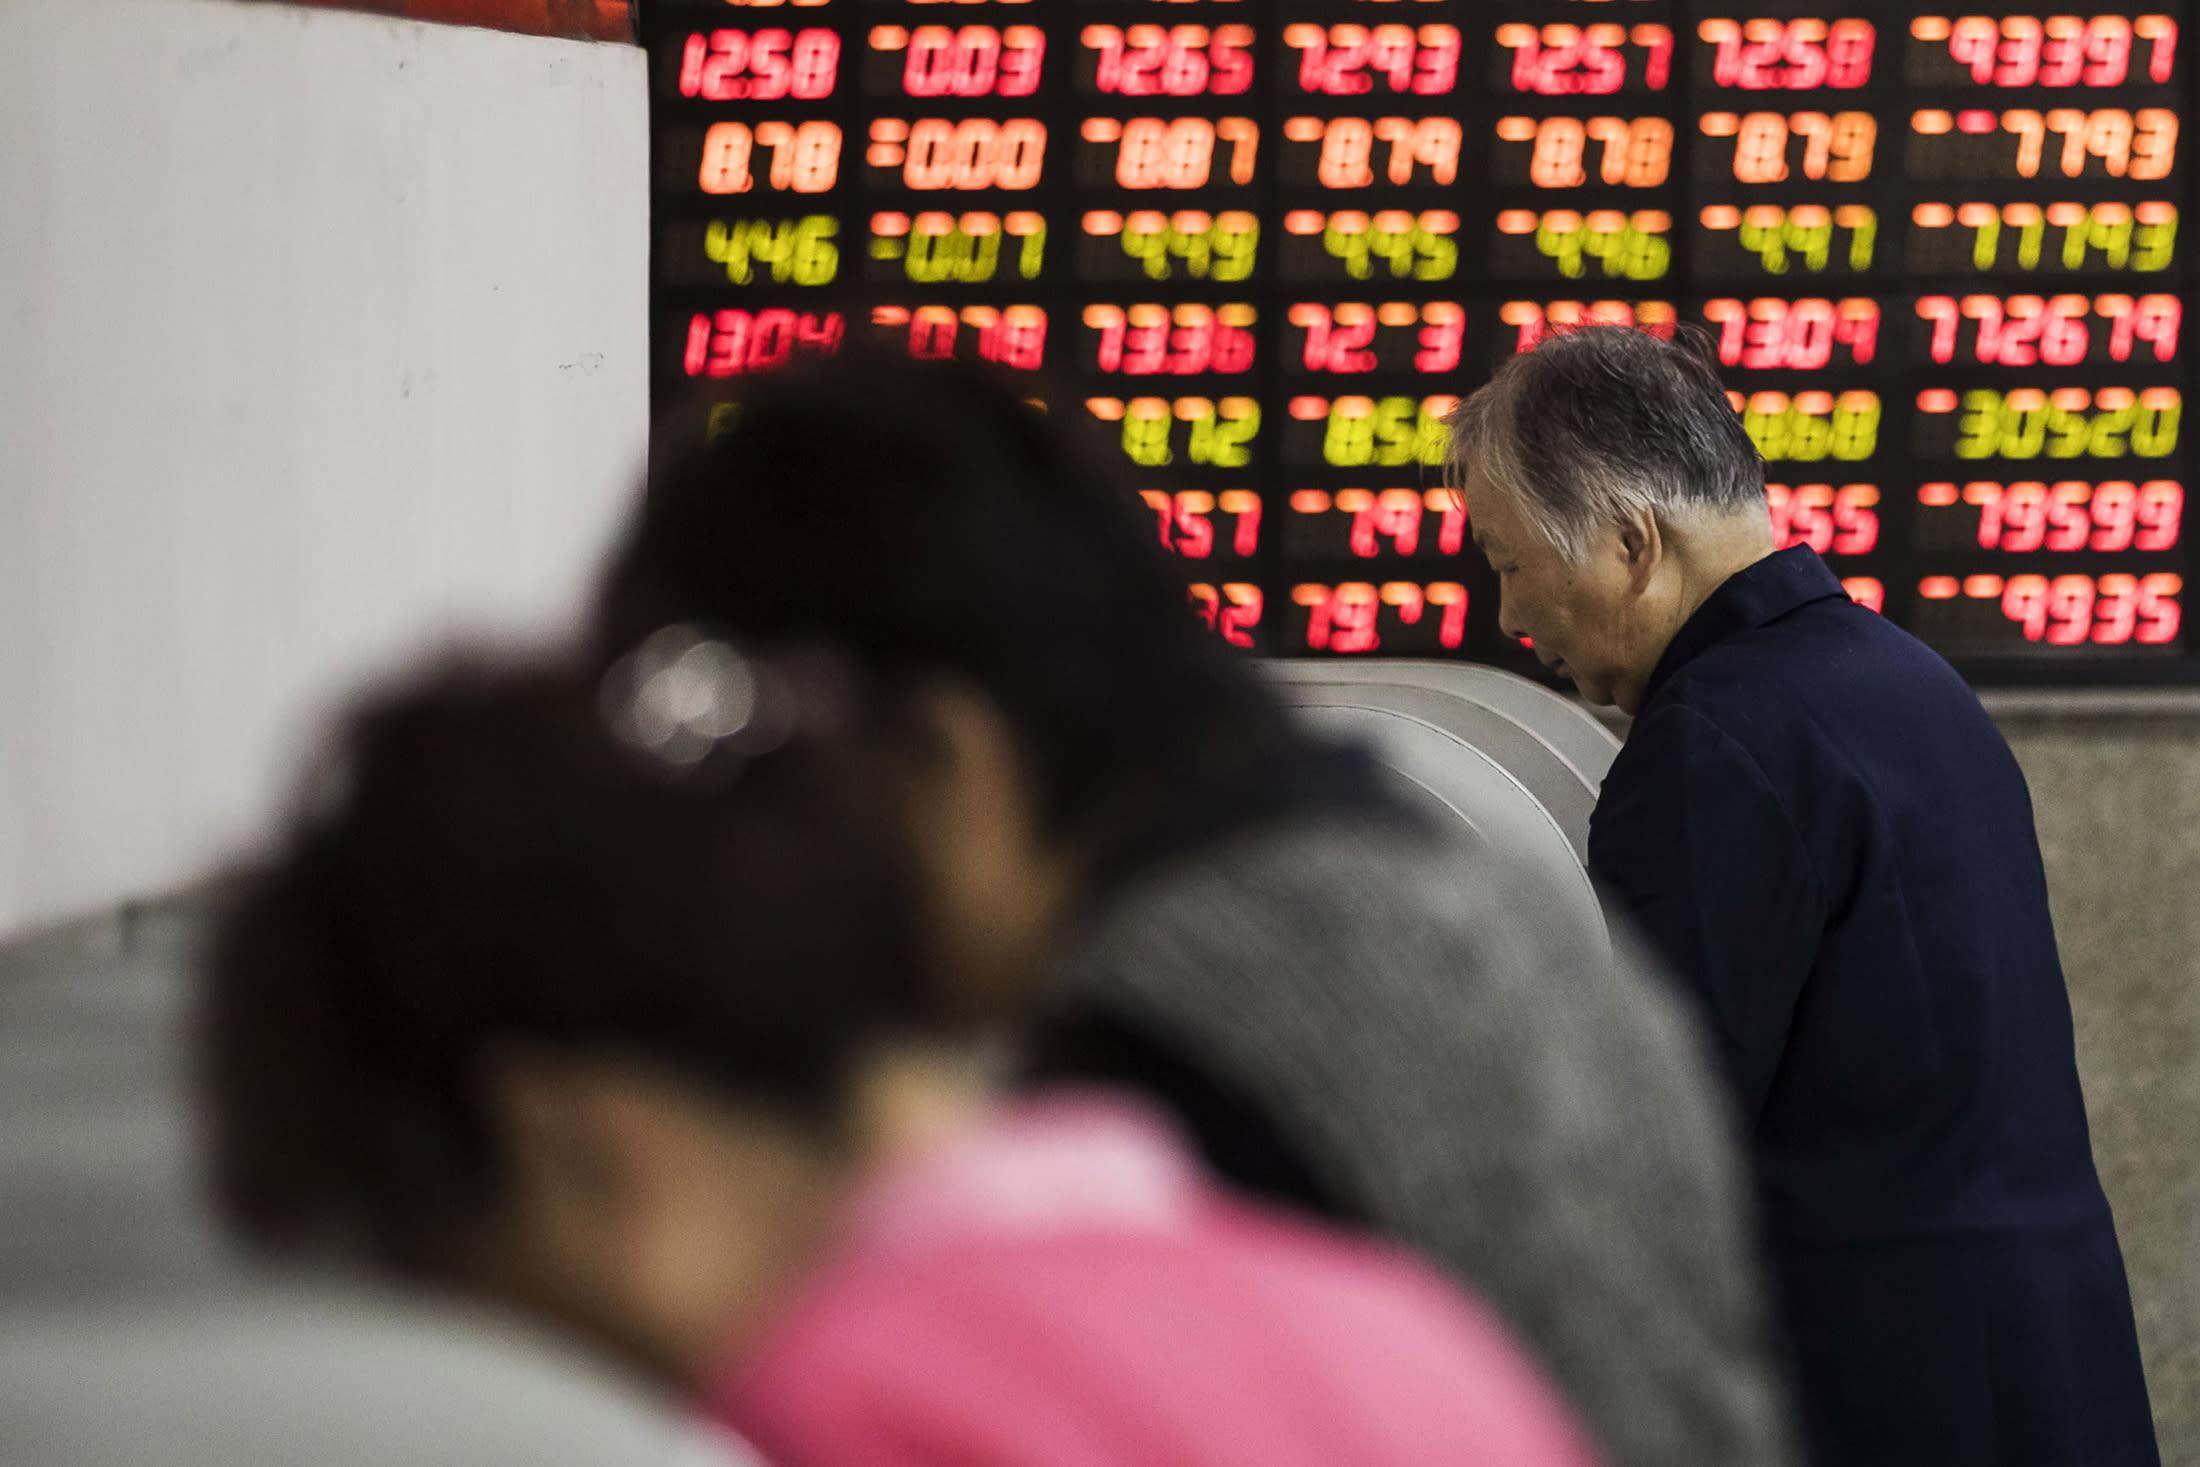 Bonds Rally, Stocks Struggle as Traders Await Fed: Markets Wrap